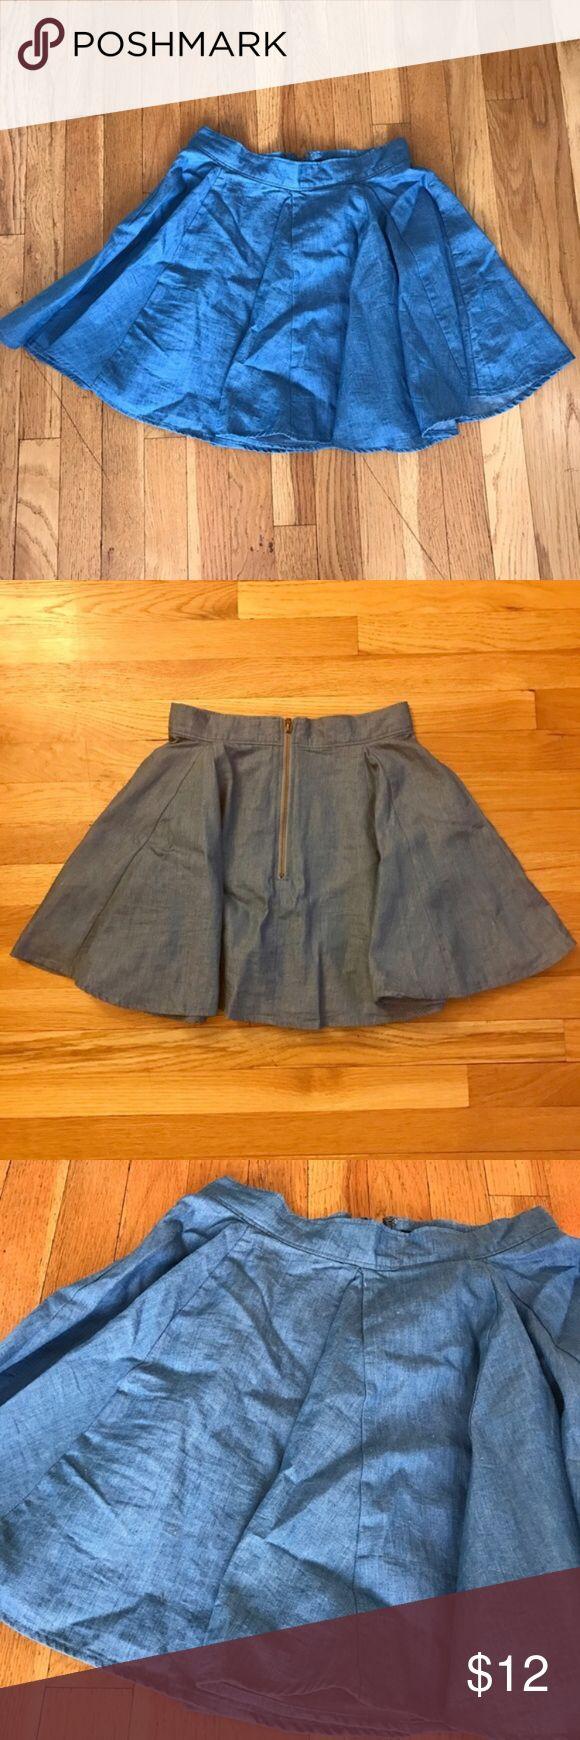 Denim Skater Skirt Cute high waisted denim Skater Skirt perfect condition Urban Outfitters Skirts Mini